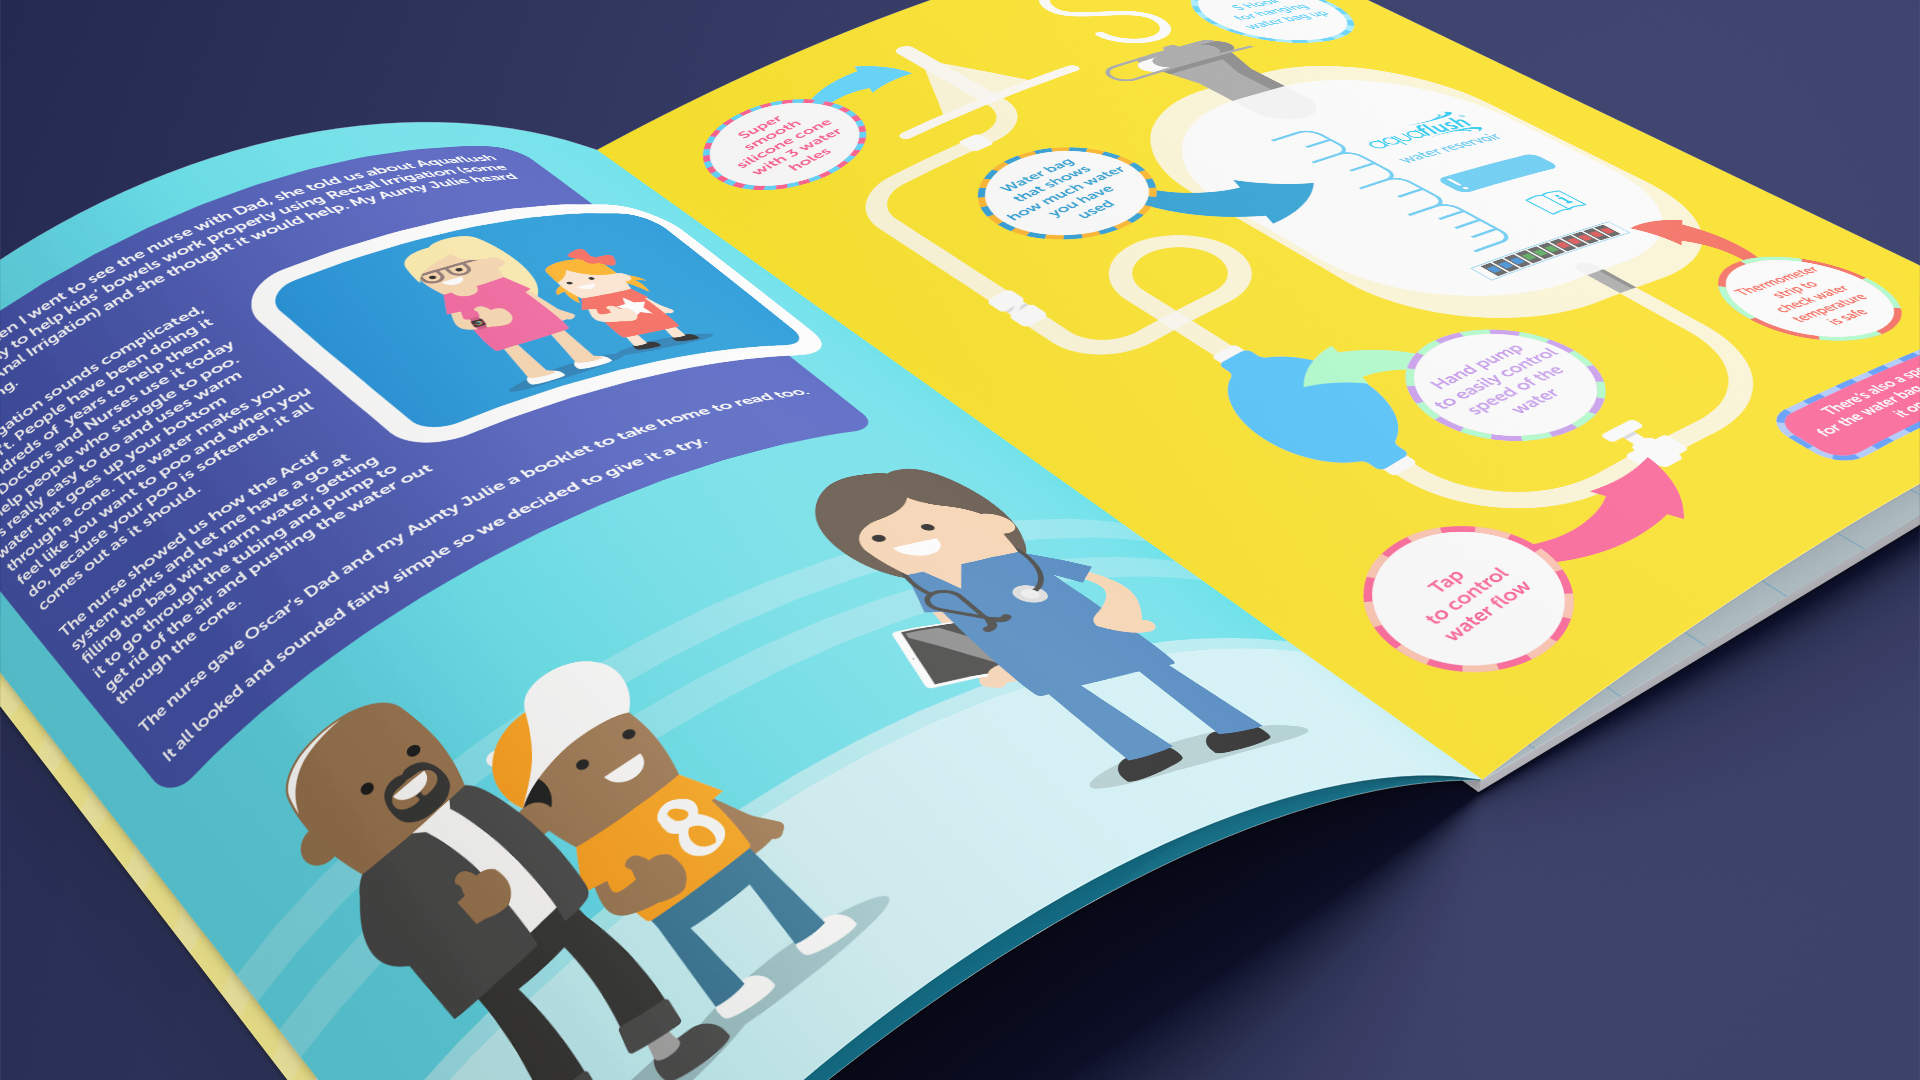 Aquaflush Medical brochure opened showing illustrations